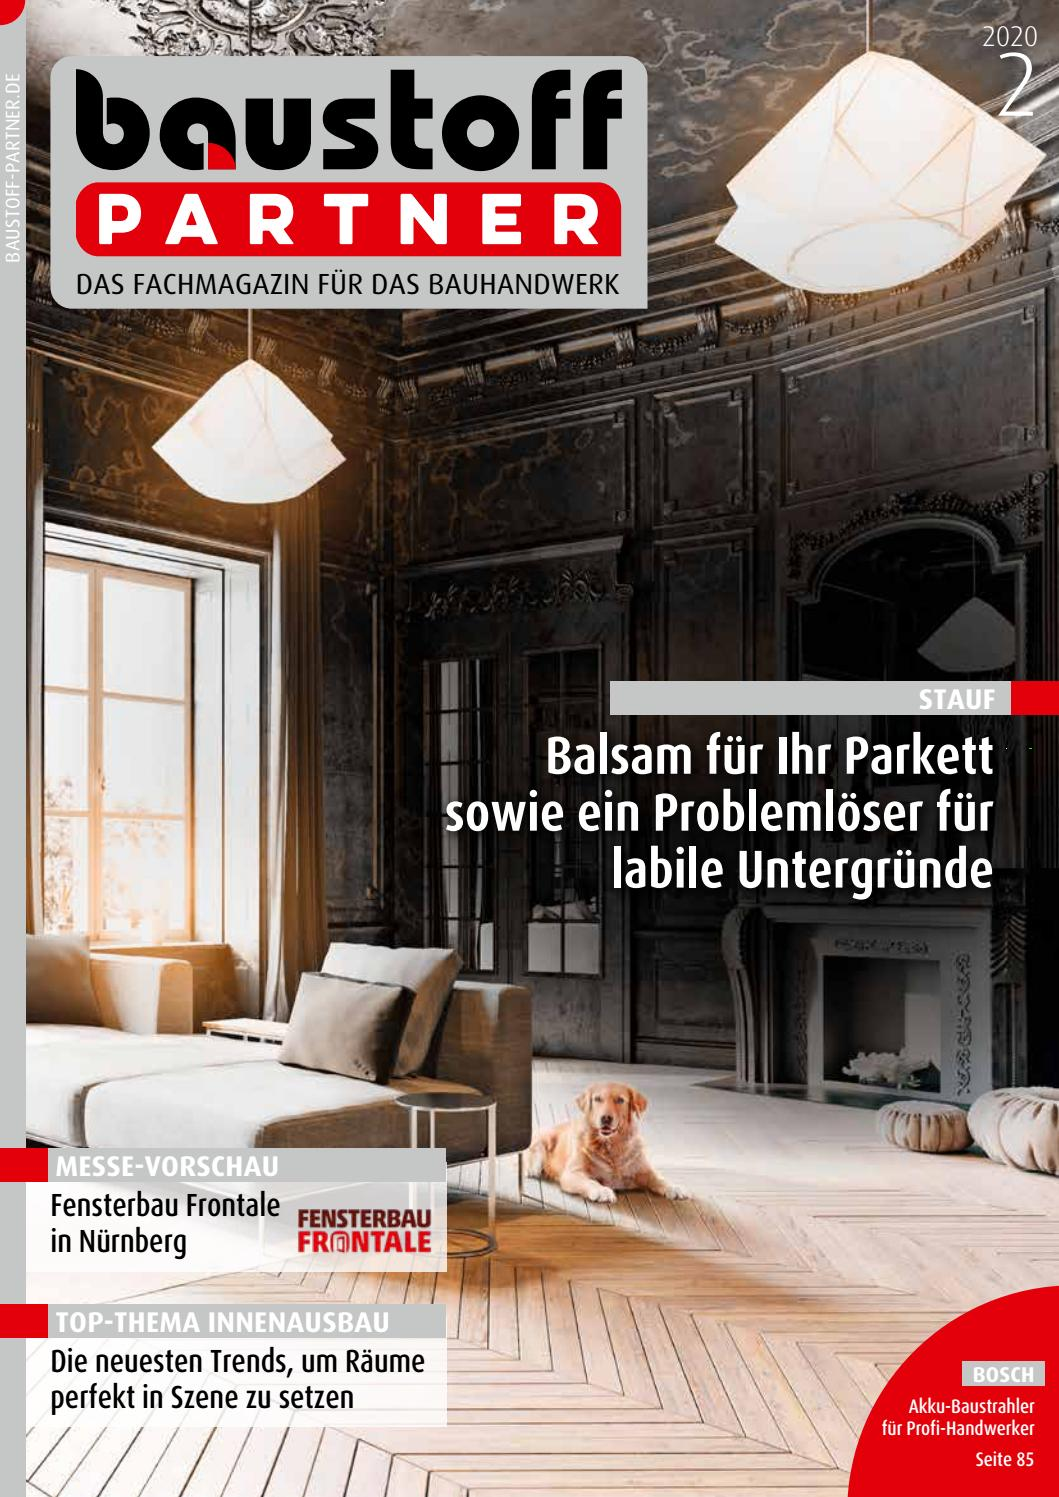 Full Size of Baustoffpartner Februar 2020 By Sbm Verlag Gmbh Drutex Fenster Test Wohnzimmer Drutex Erfahrungen Forum